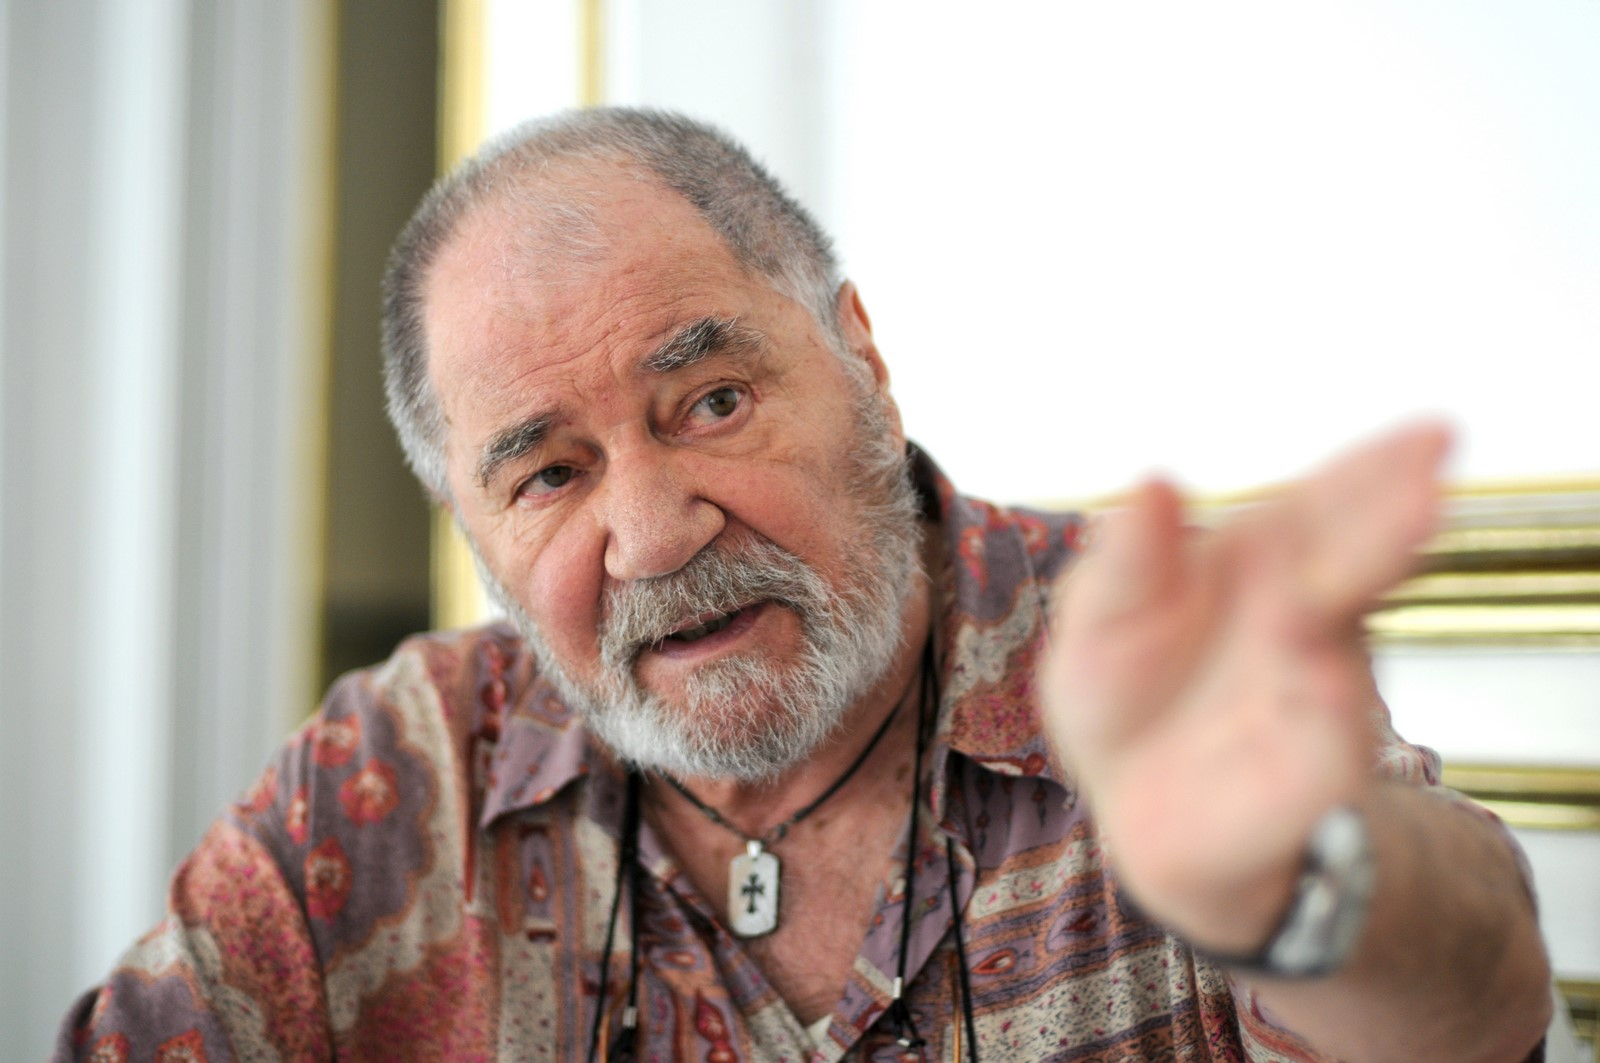 Sitterli: Am râs și am plâns cu actorul Ion Besoiu